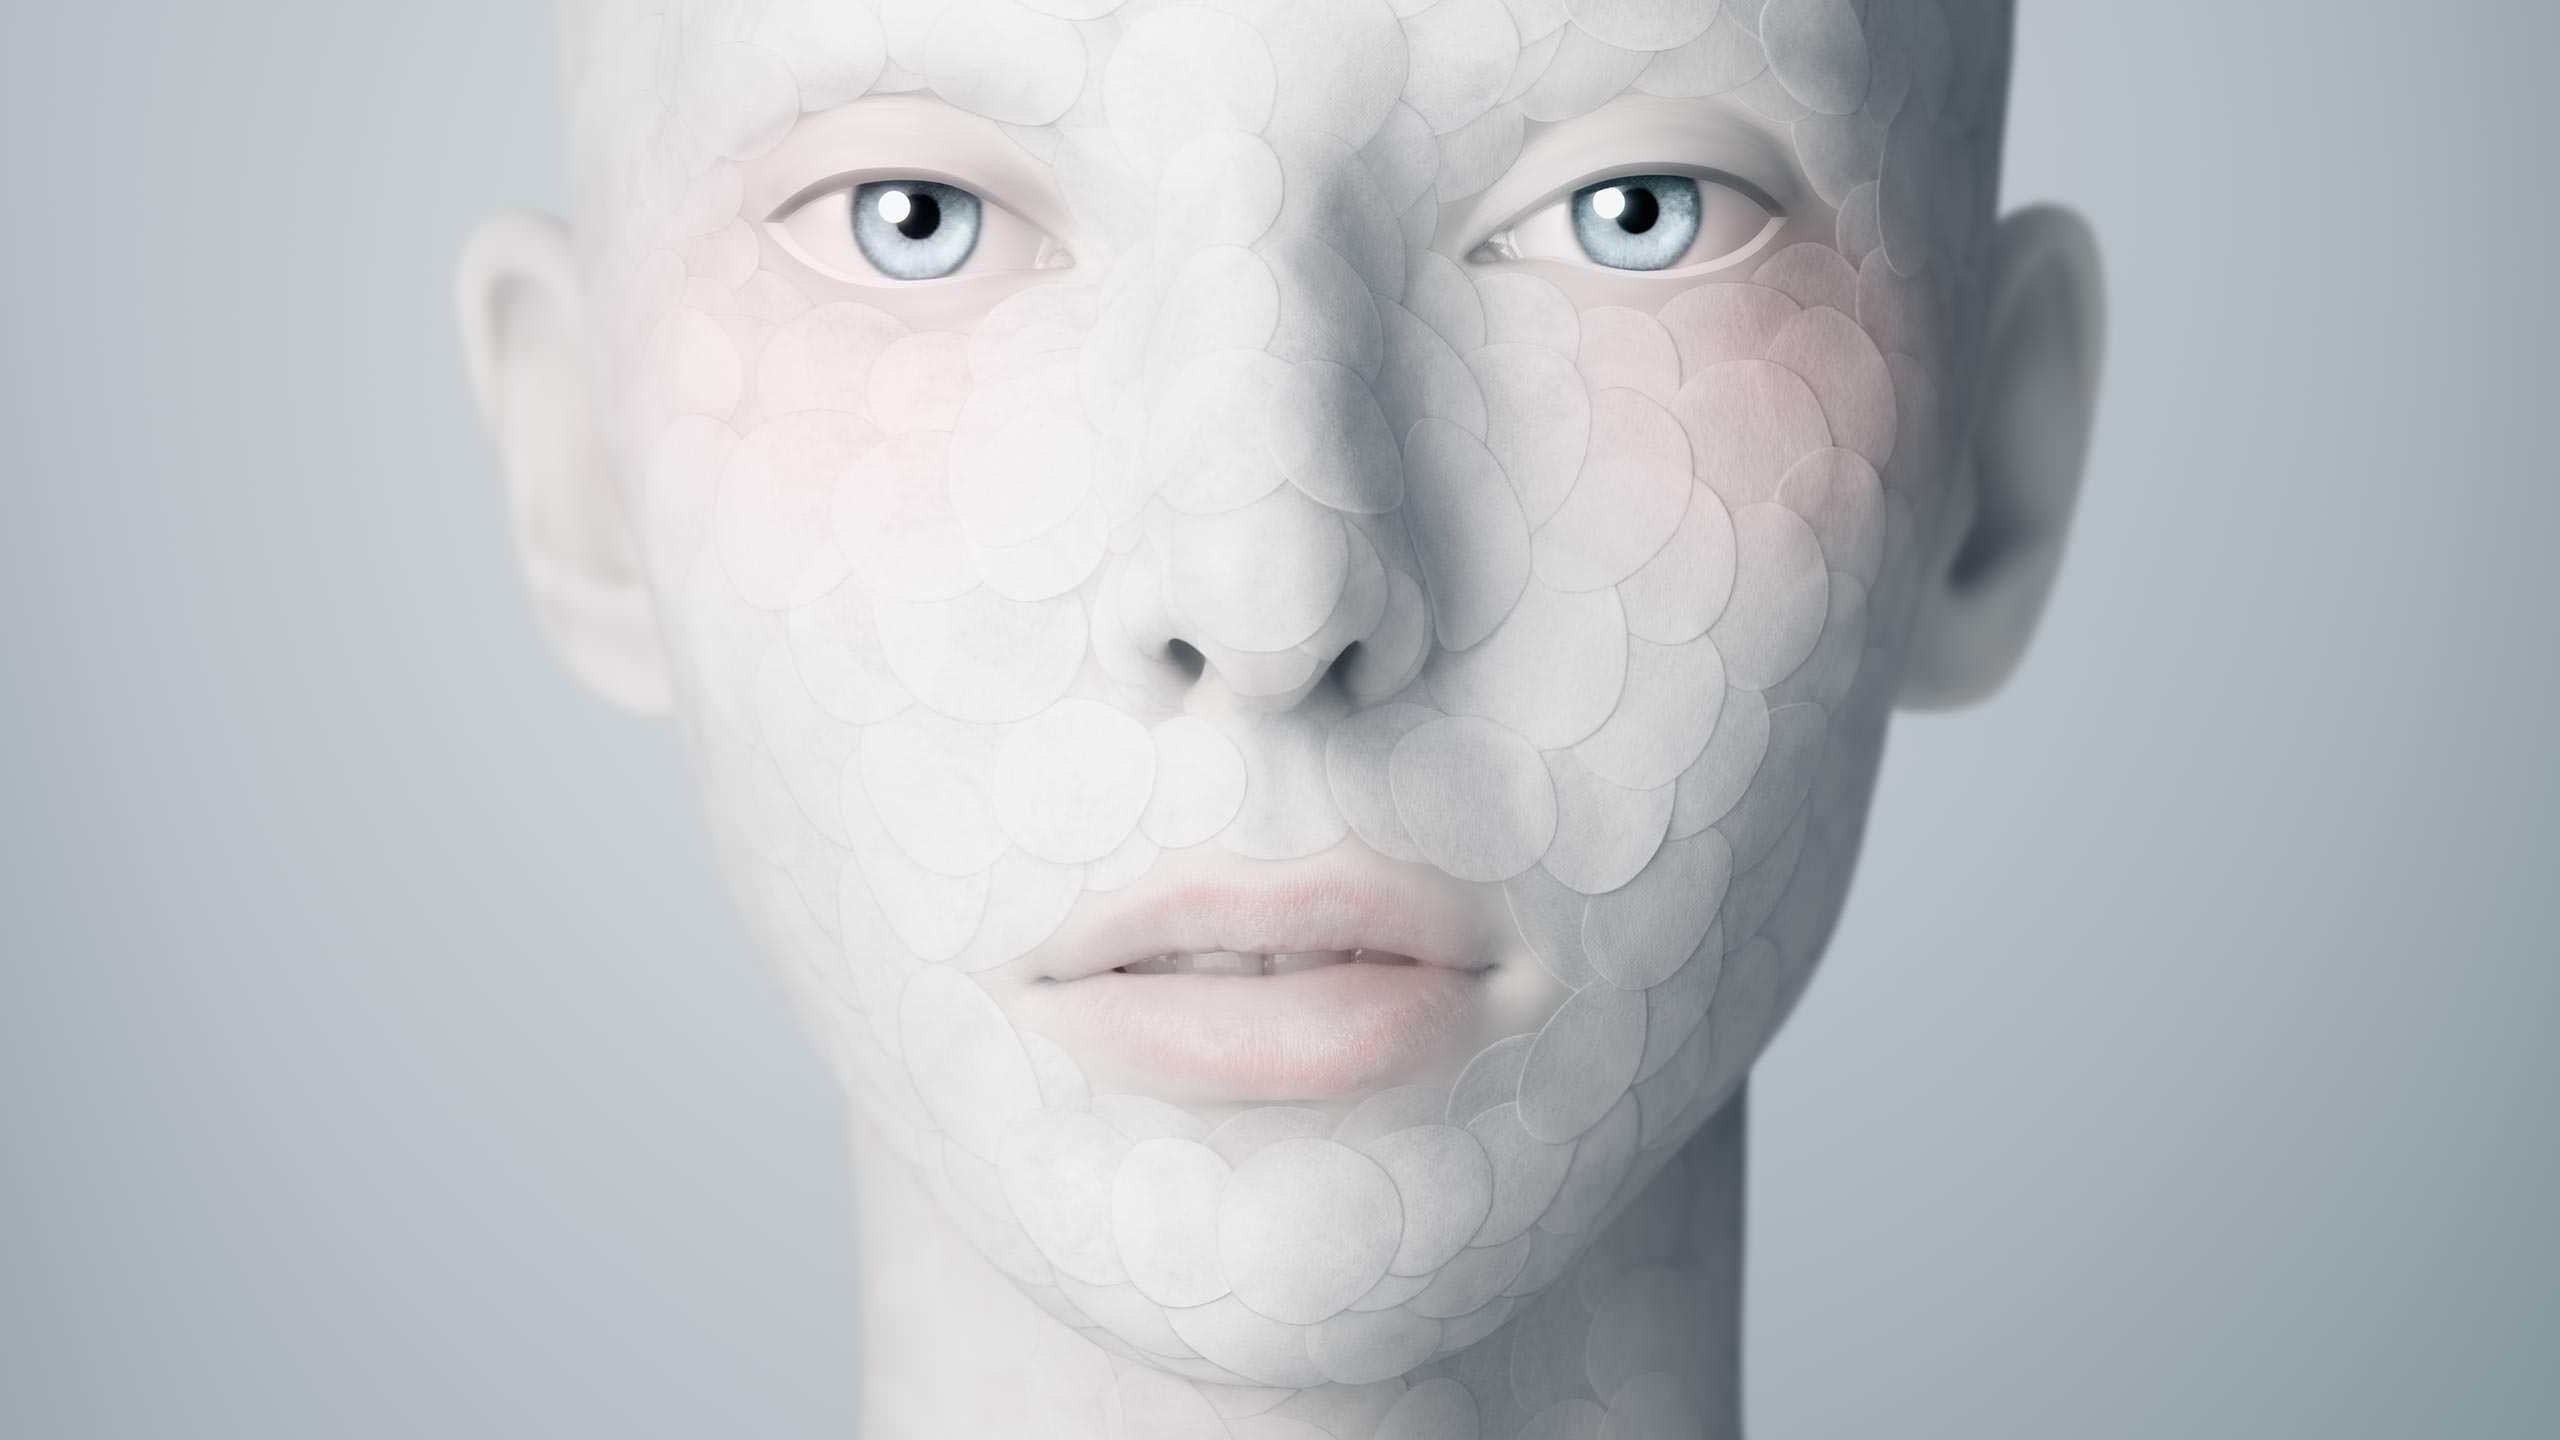 Adobe CS6 Photoshop Campaign of hero face